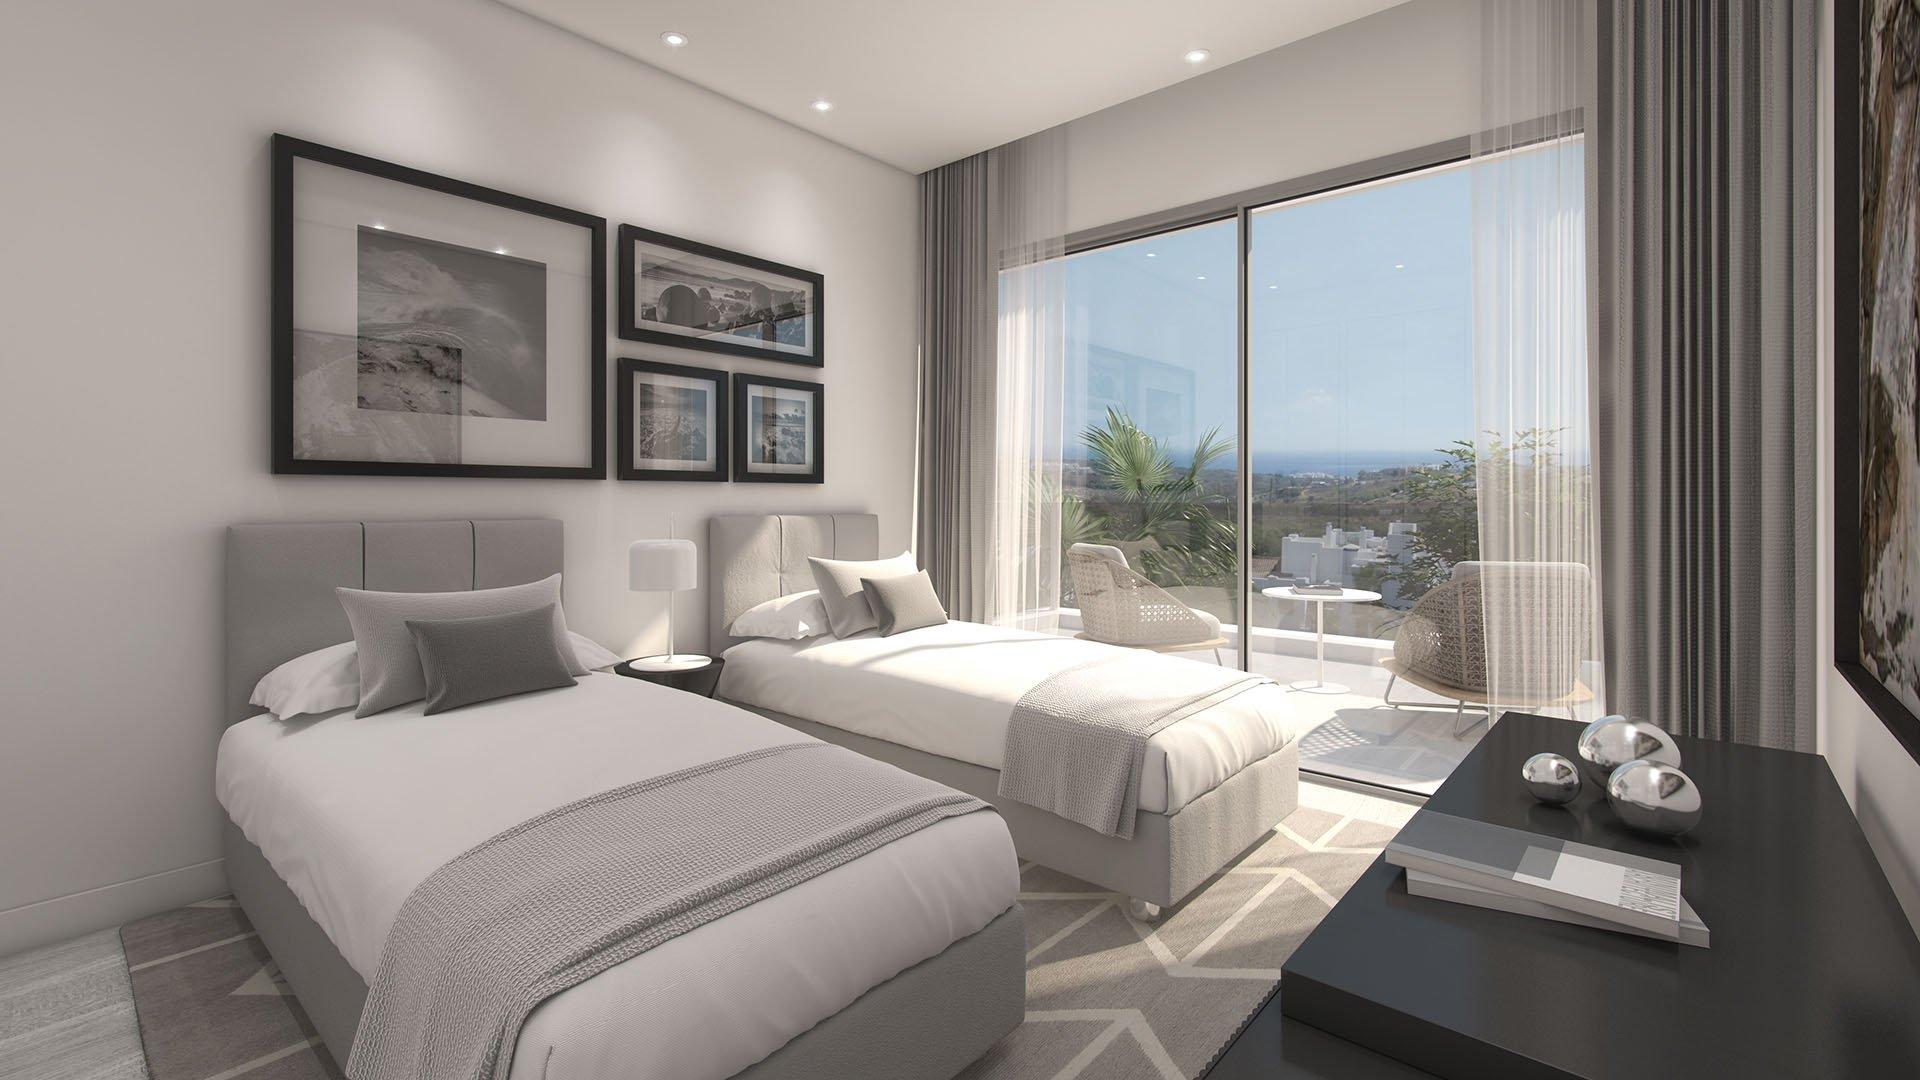 Alcazaba Lagoon: Mediterranean-style apartments in a lovely green neighbourhood